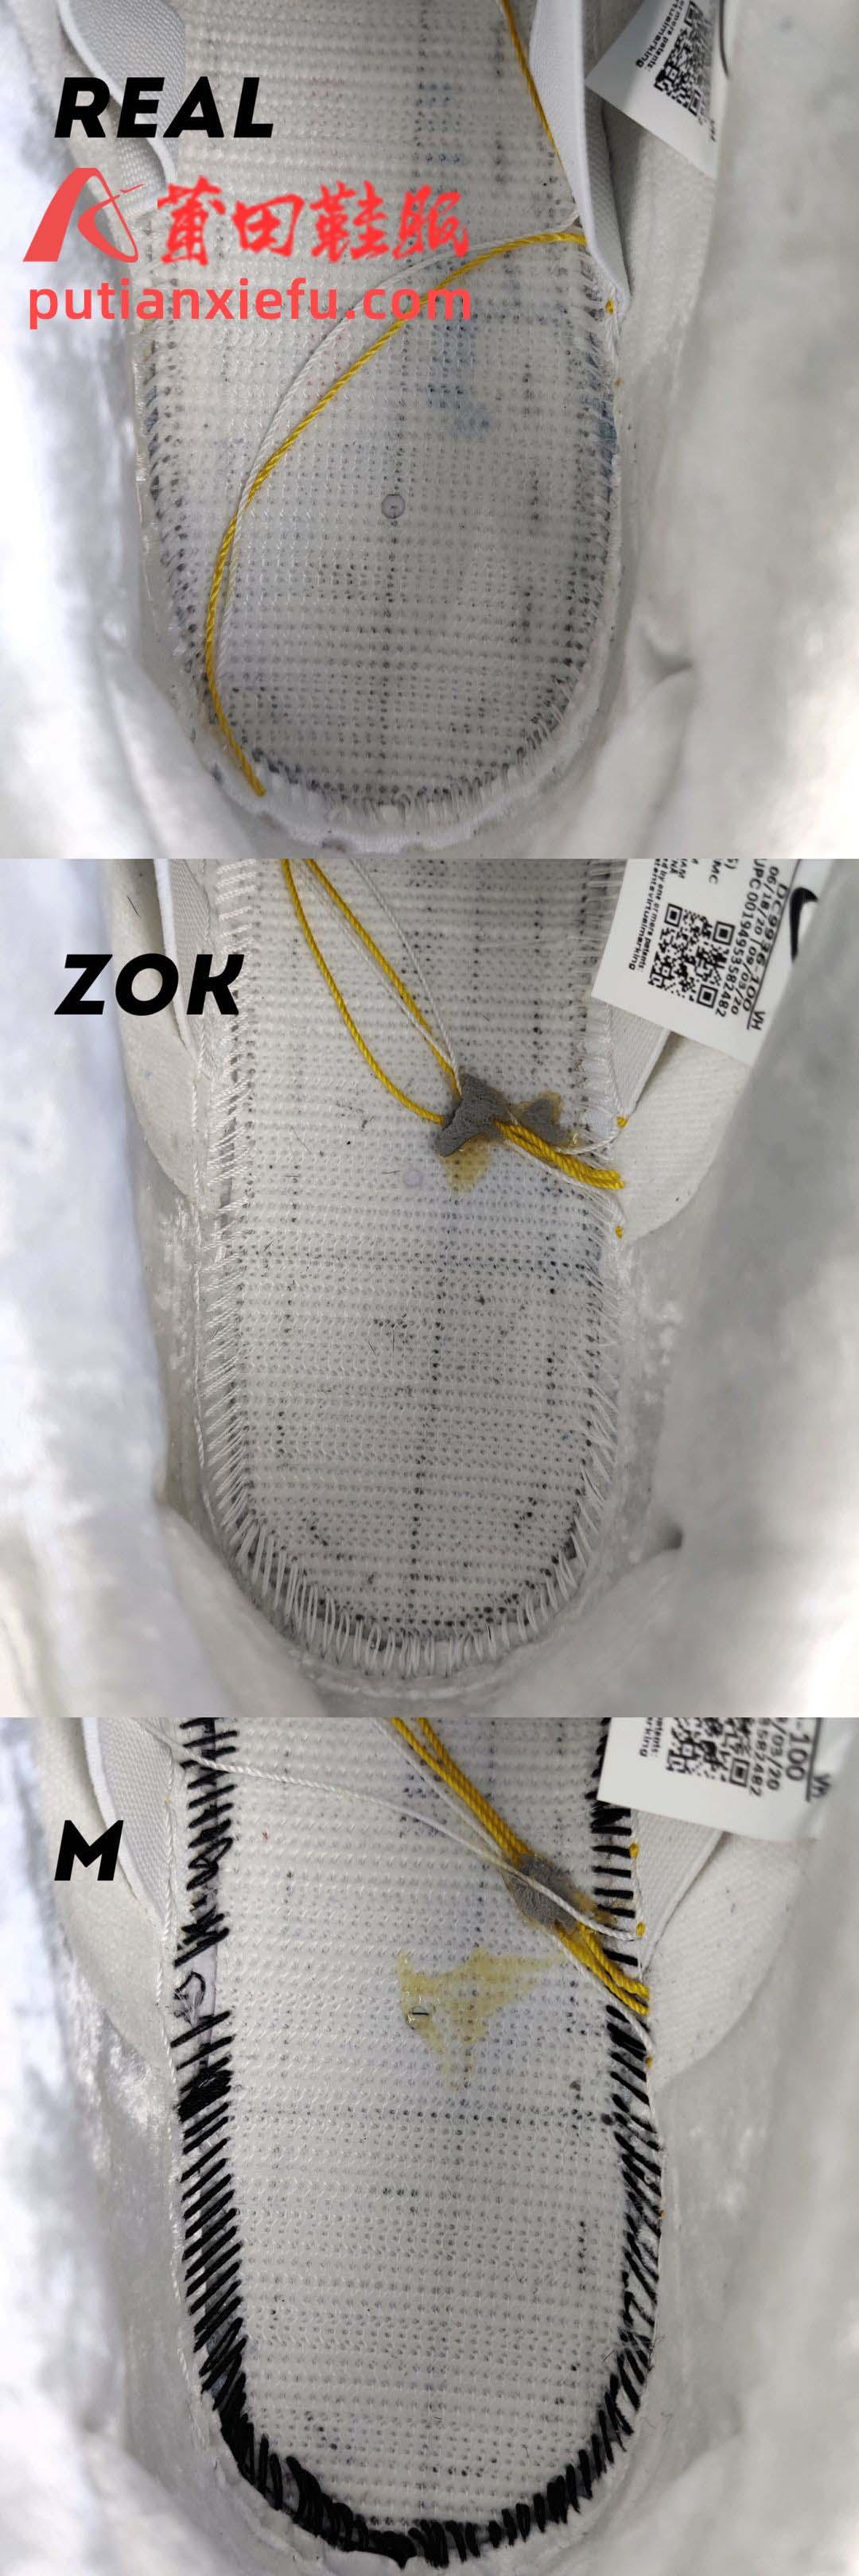 ZOK dunk 冰雪奇缘真牛还是吹牛?真假对比